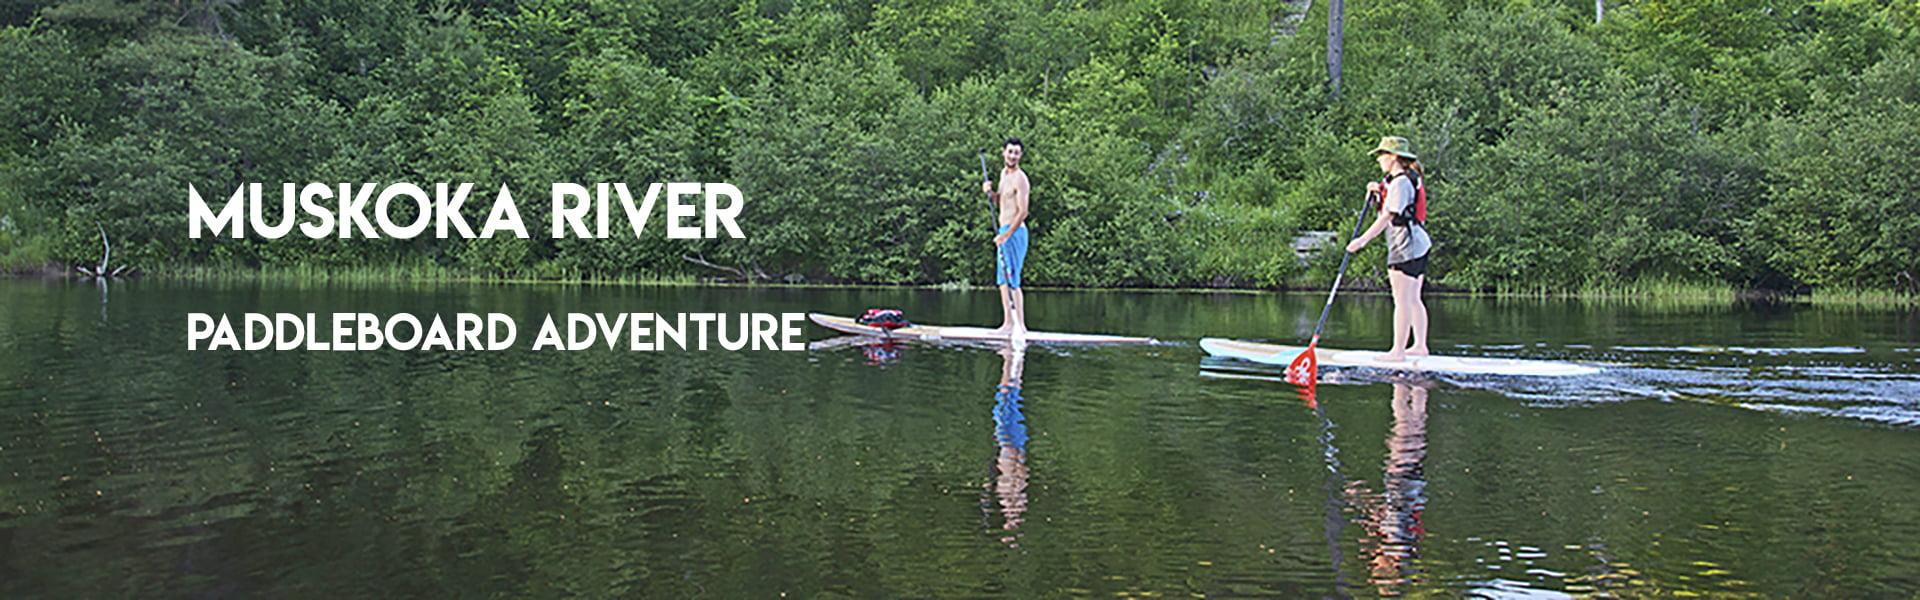 Muskoka River Paddleboard Adventure